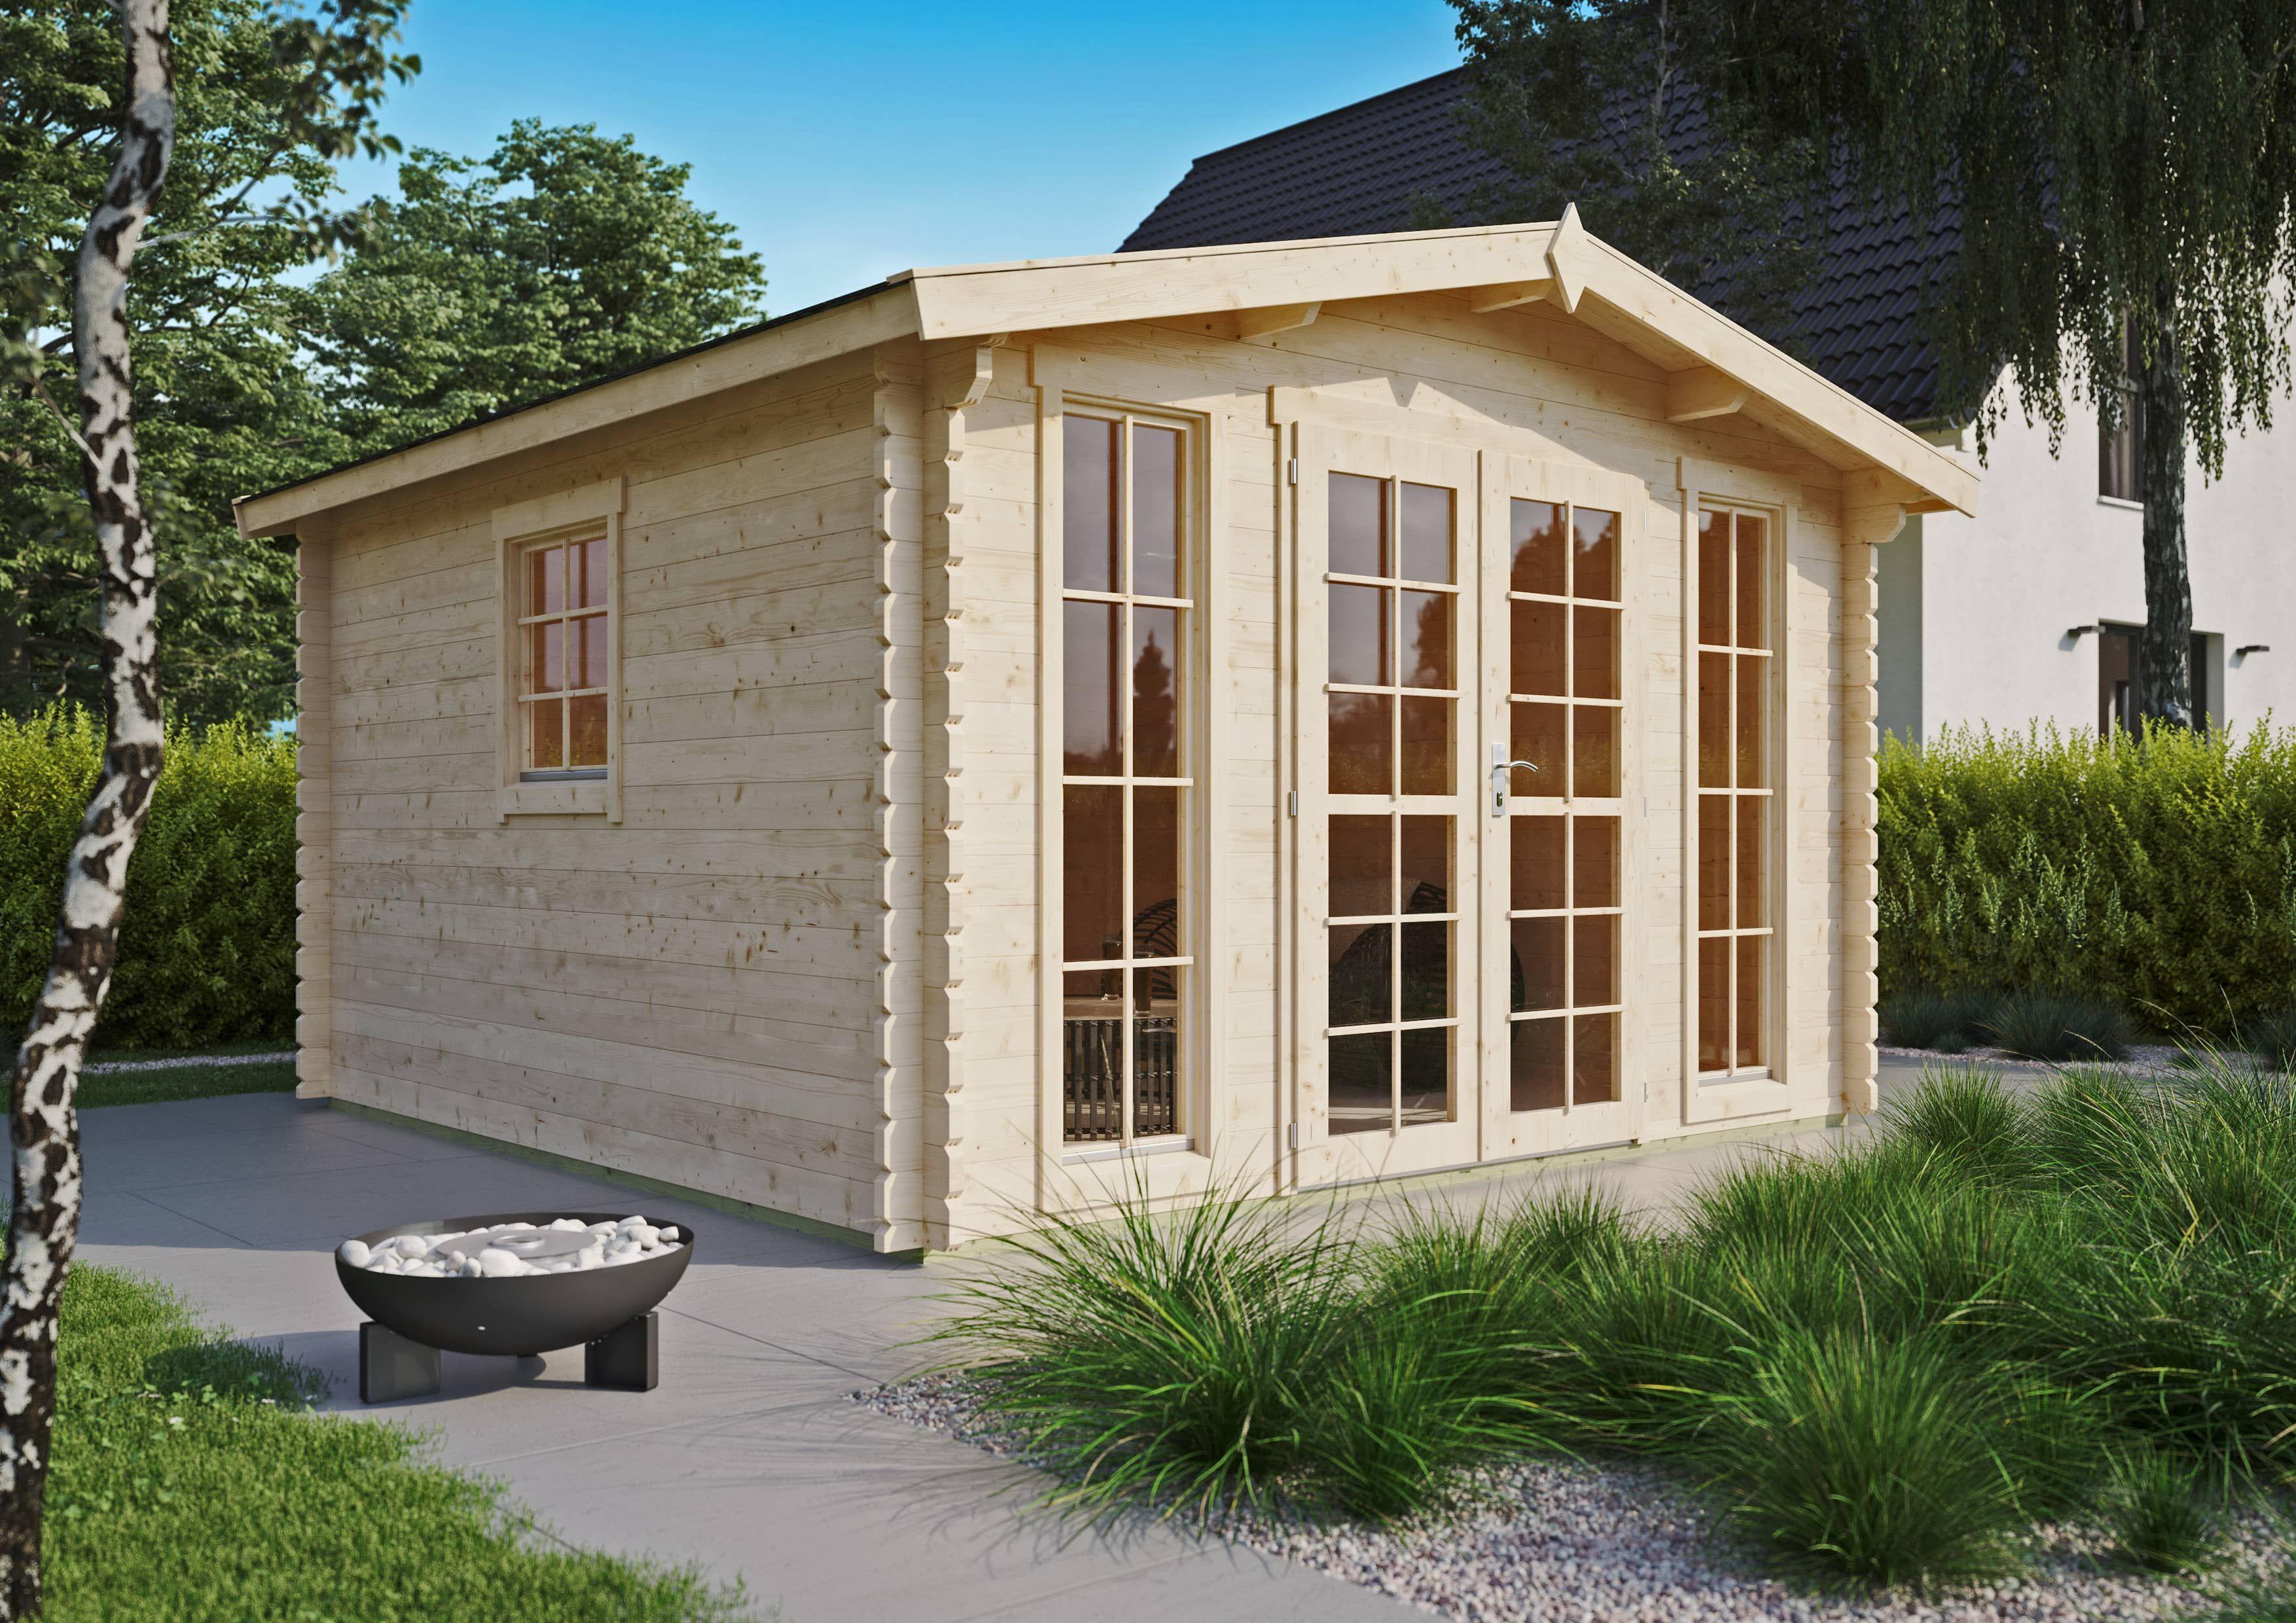 Modernes Gartenhaus Enrico 40 A Haus Gartenhaus Gartenhaus Mit Sauna